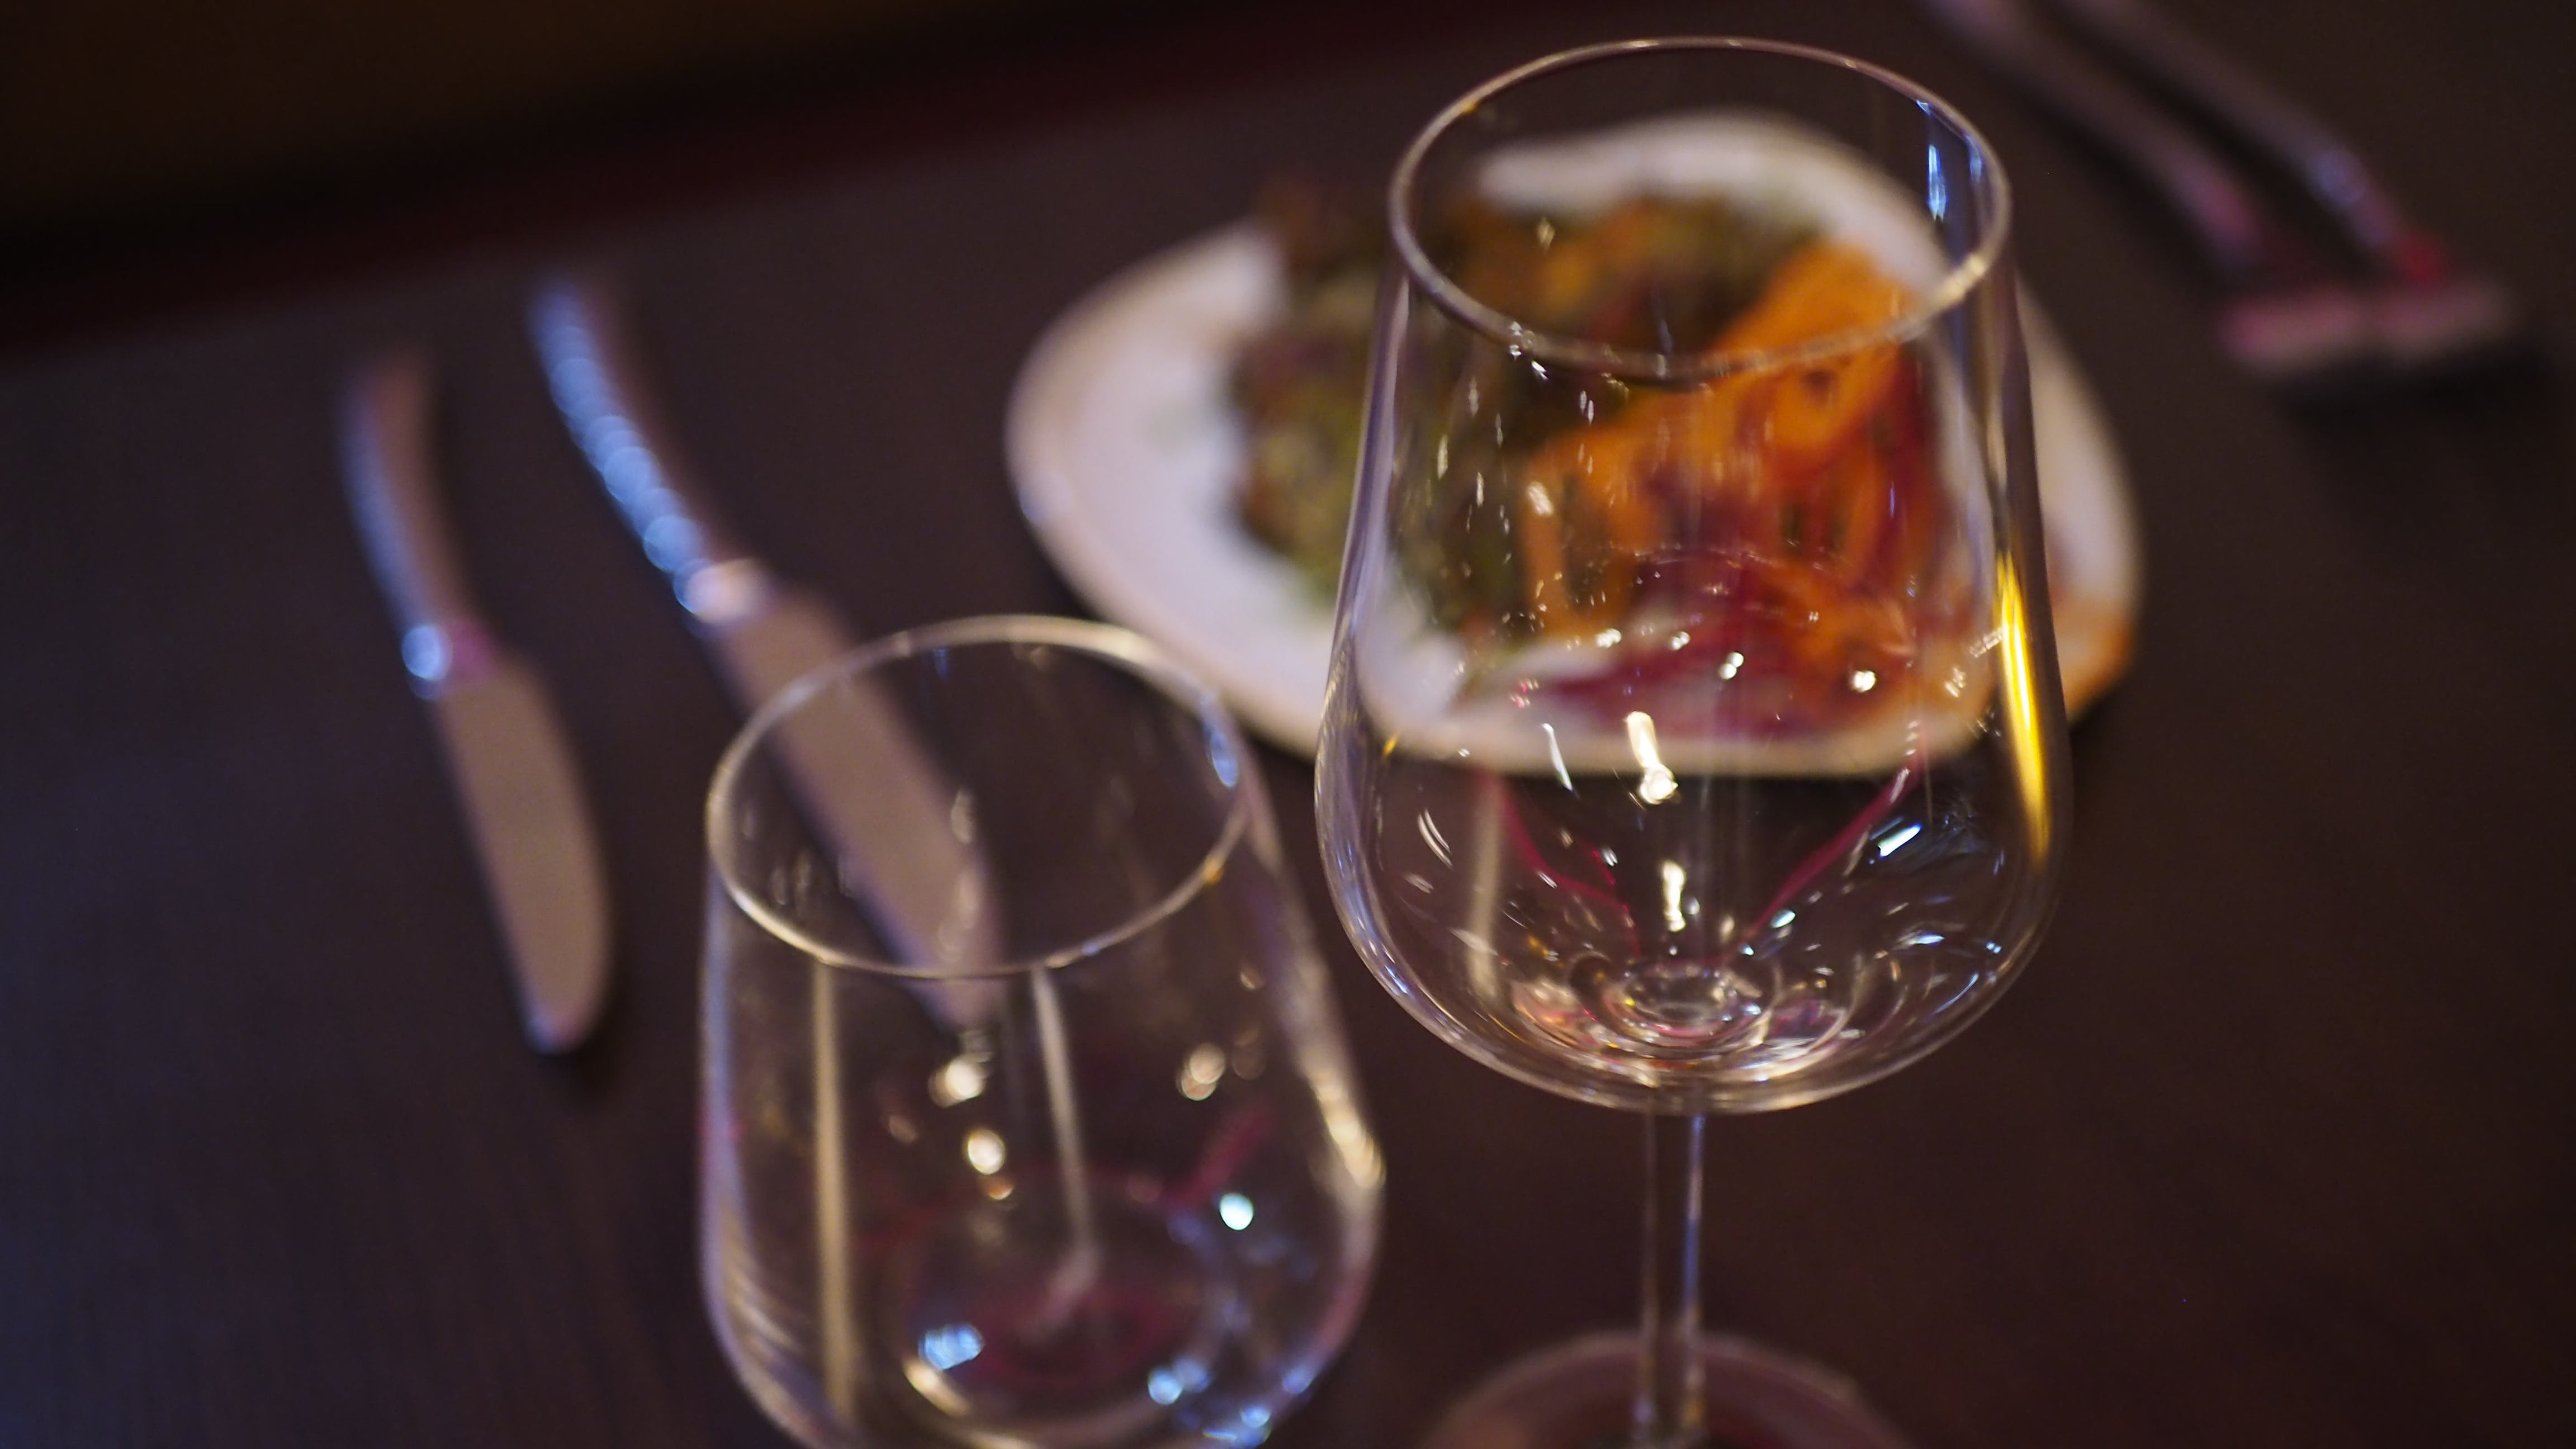 Free stock photo of food, glasses, wine glasses